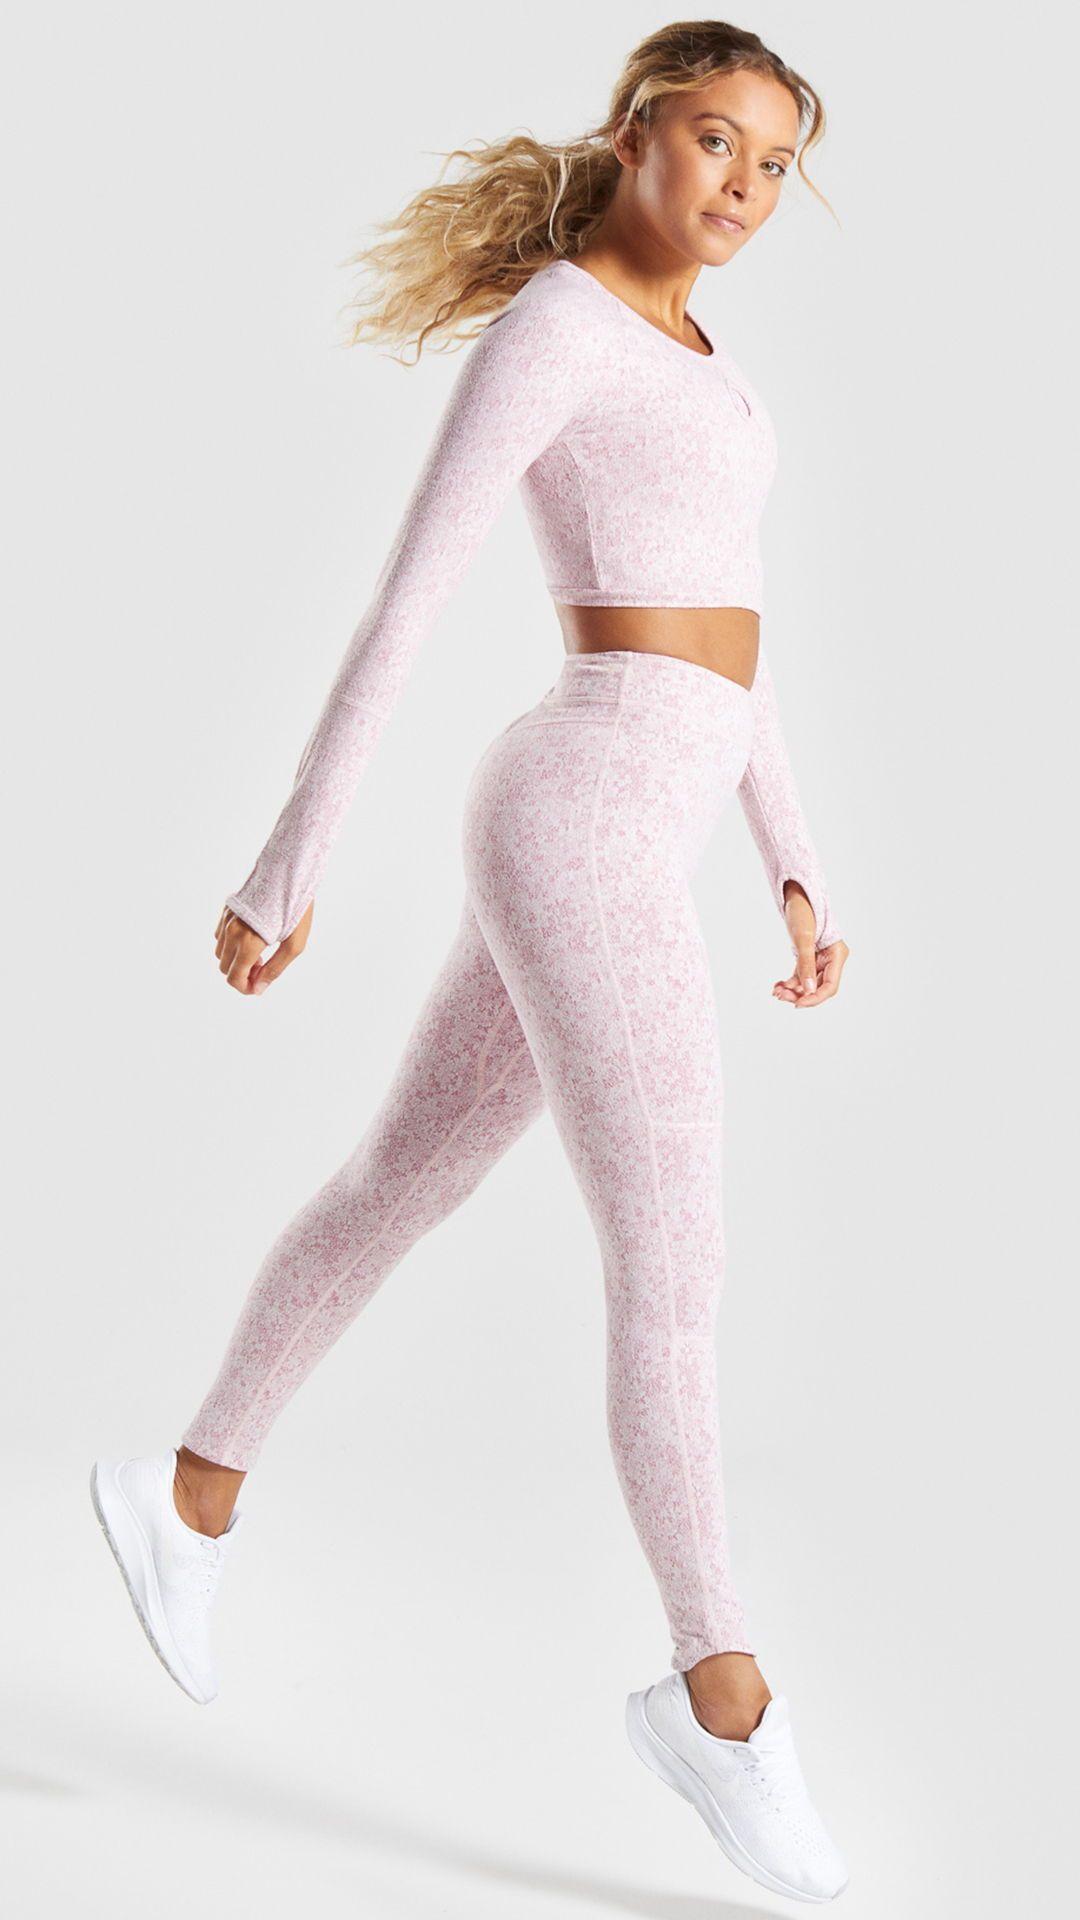 823422f67f4c9c The Fleur Texture Long Sleeve Crop Top, Dusky Pink. Tough for training,  delicate